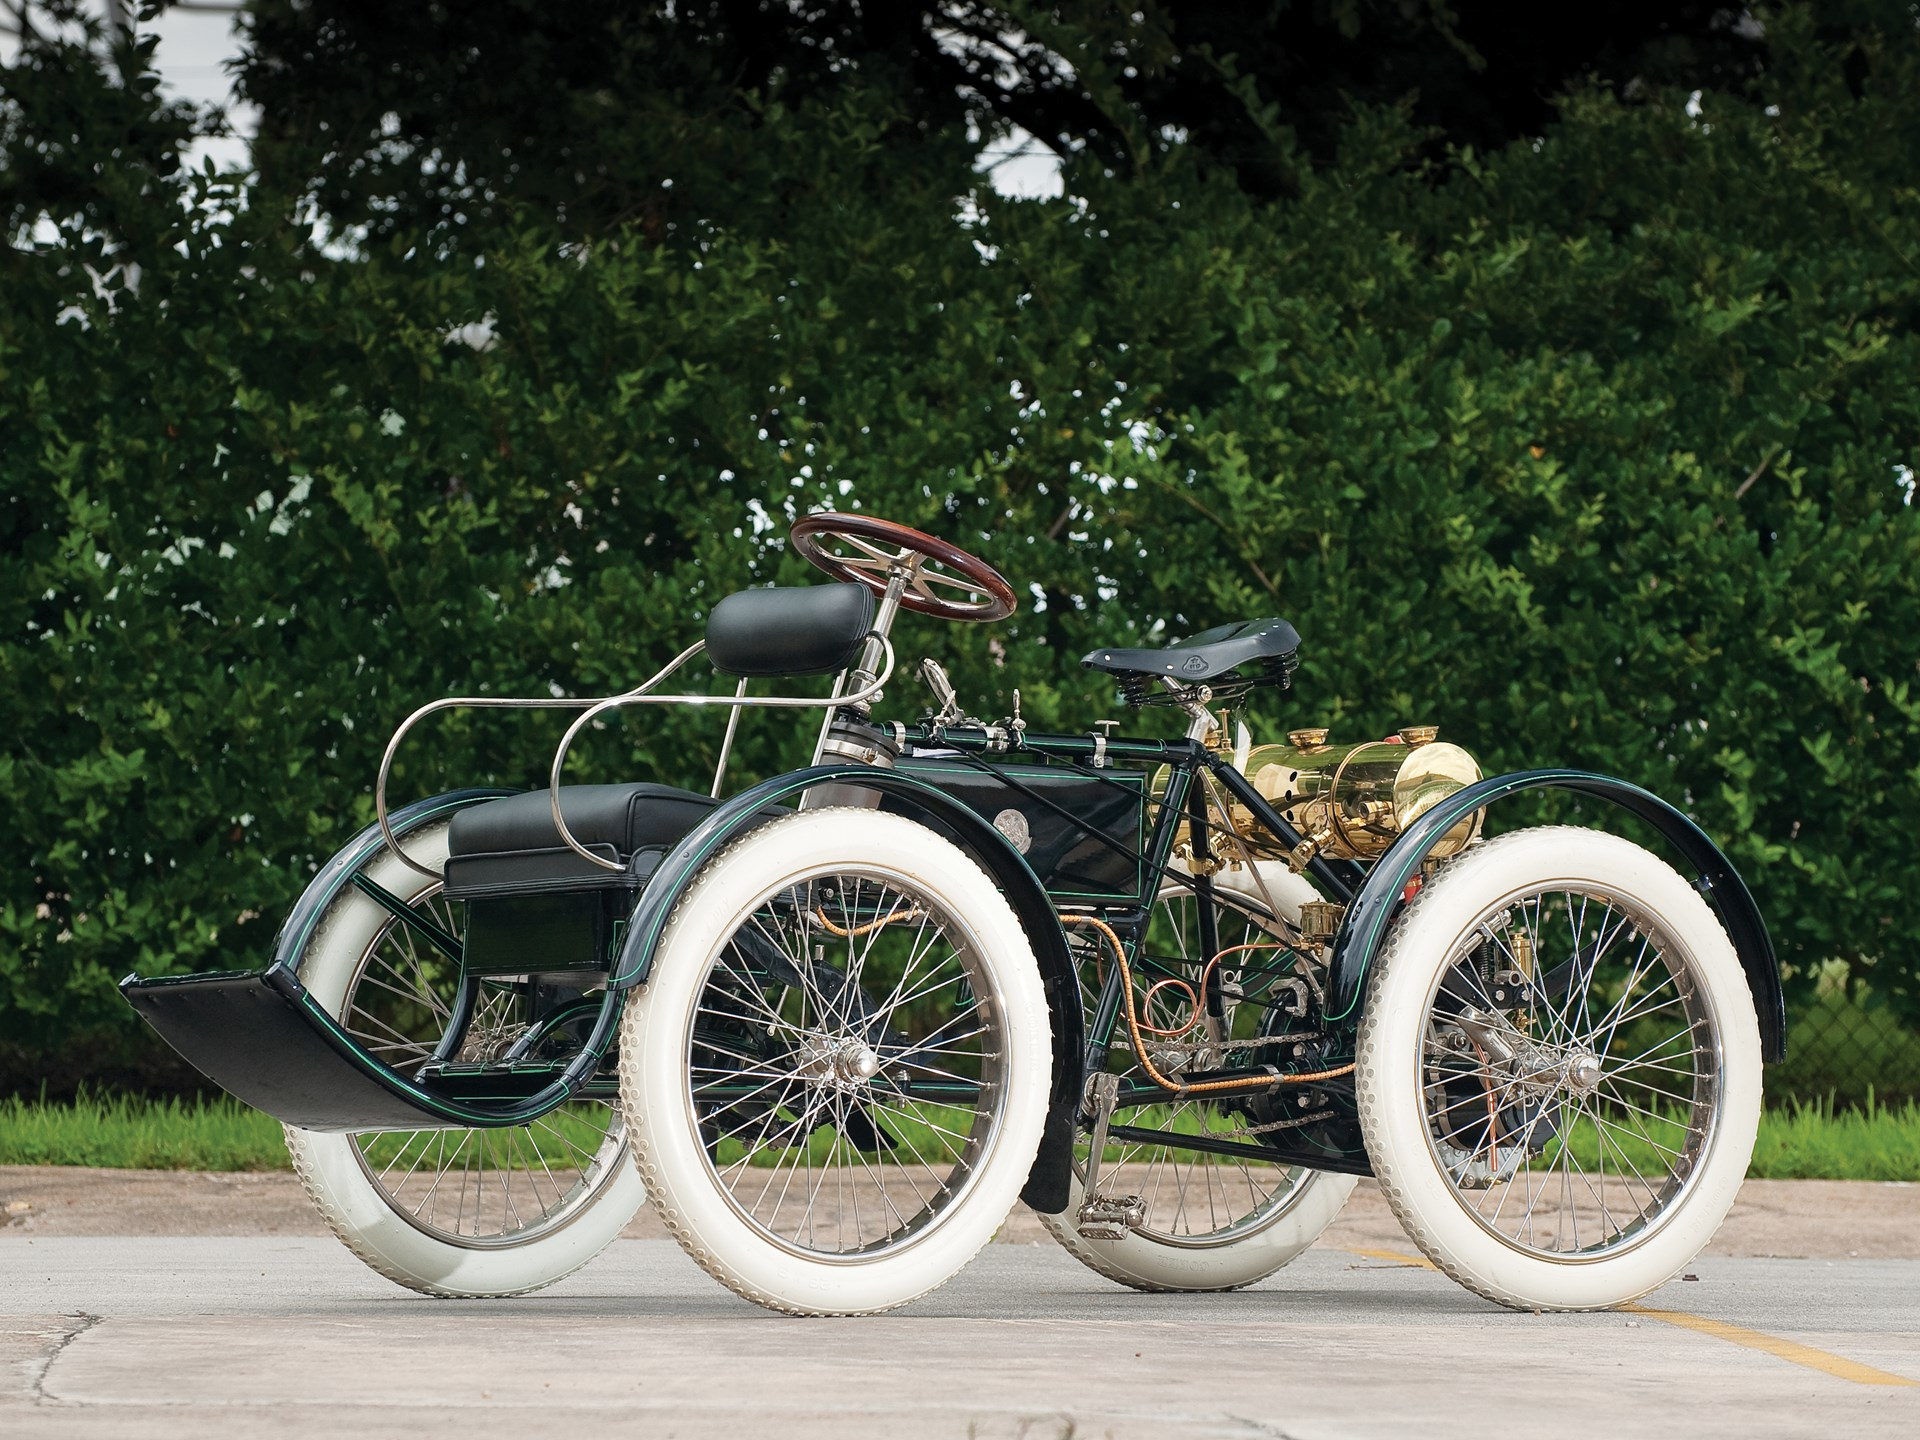 RM Sotheby's - 1900 DeDion-Bouton Perfecta Quadricycle